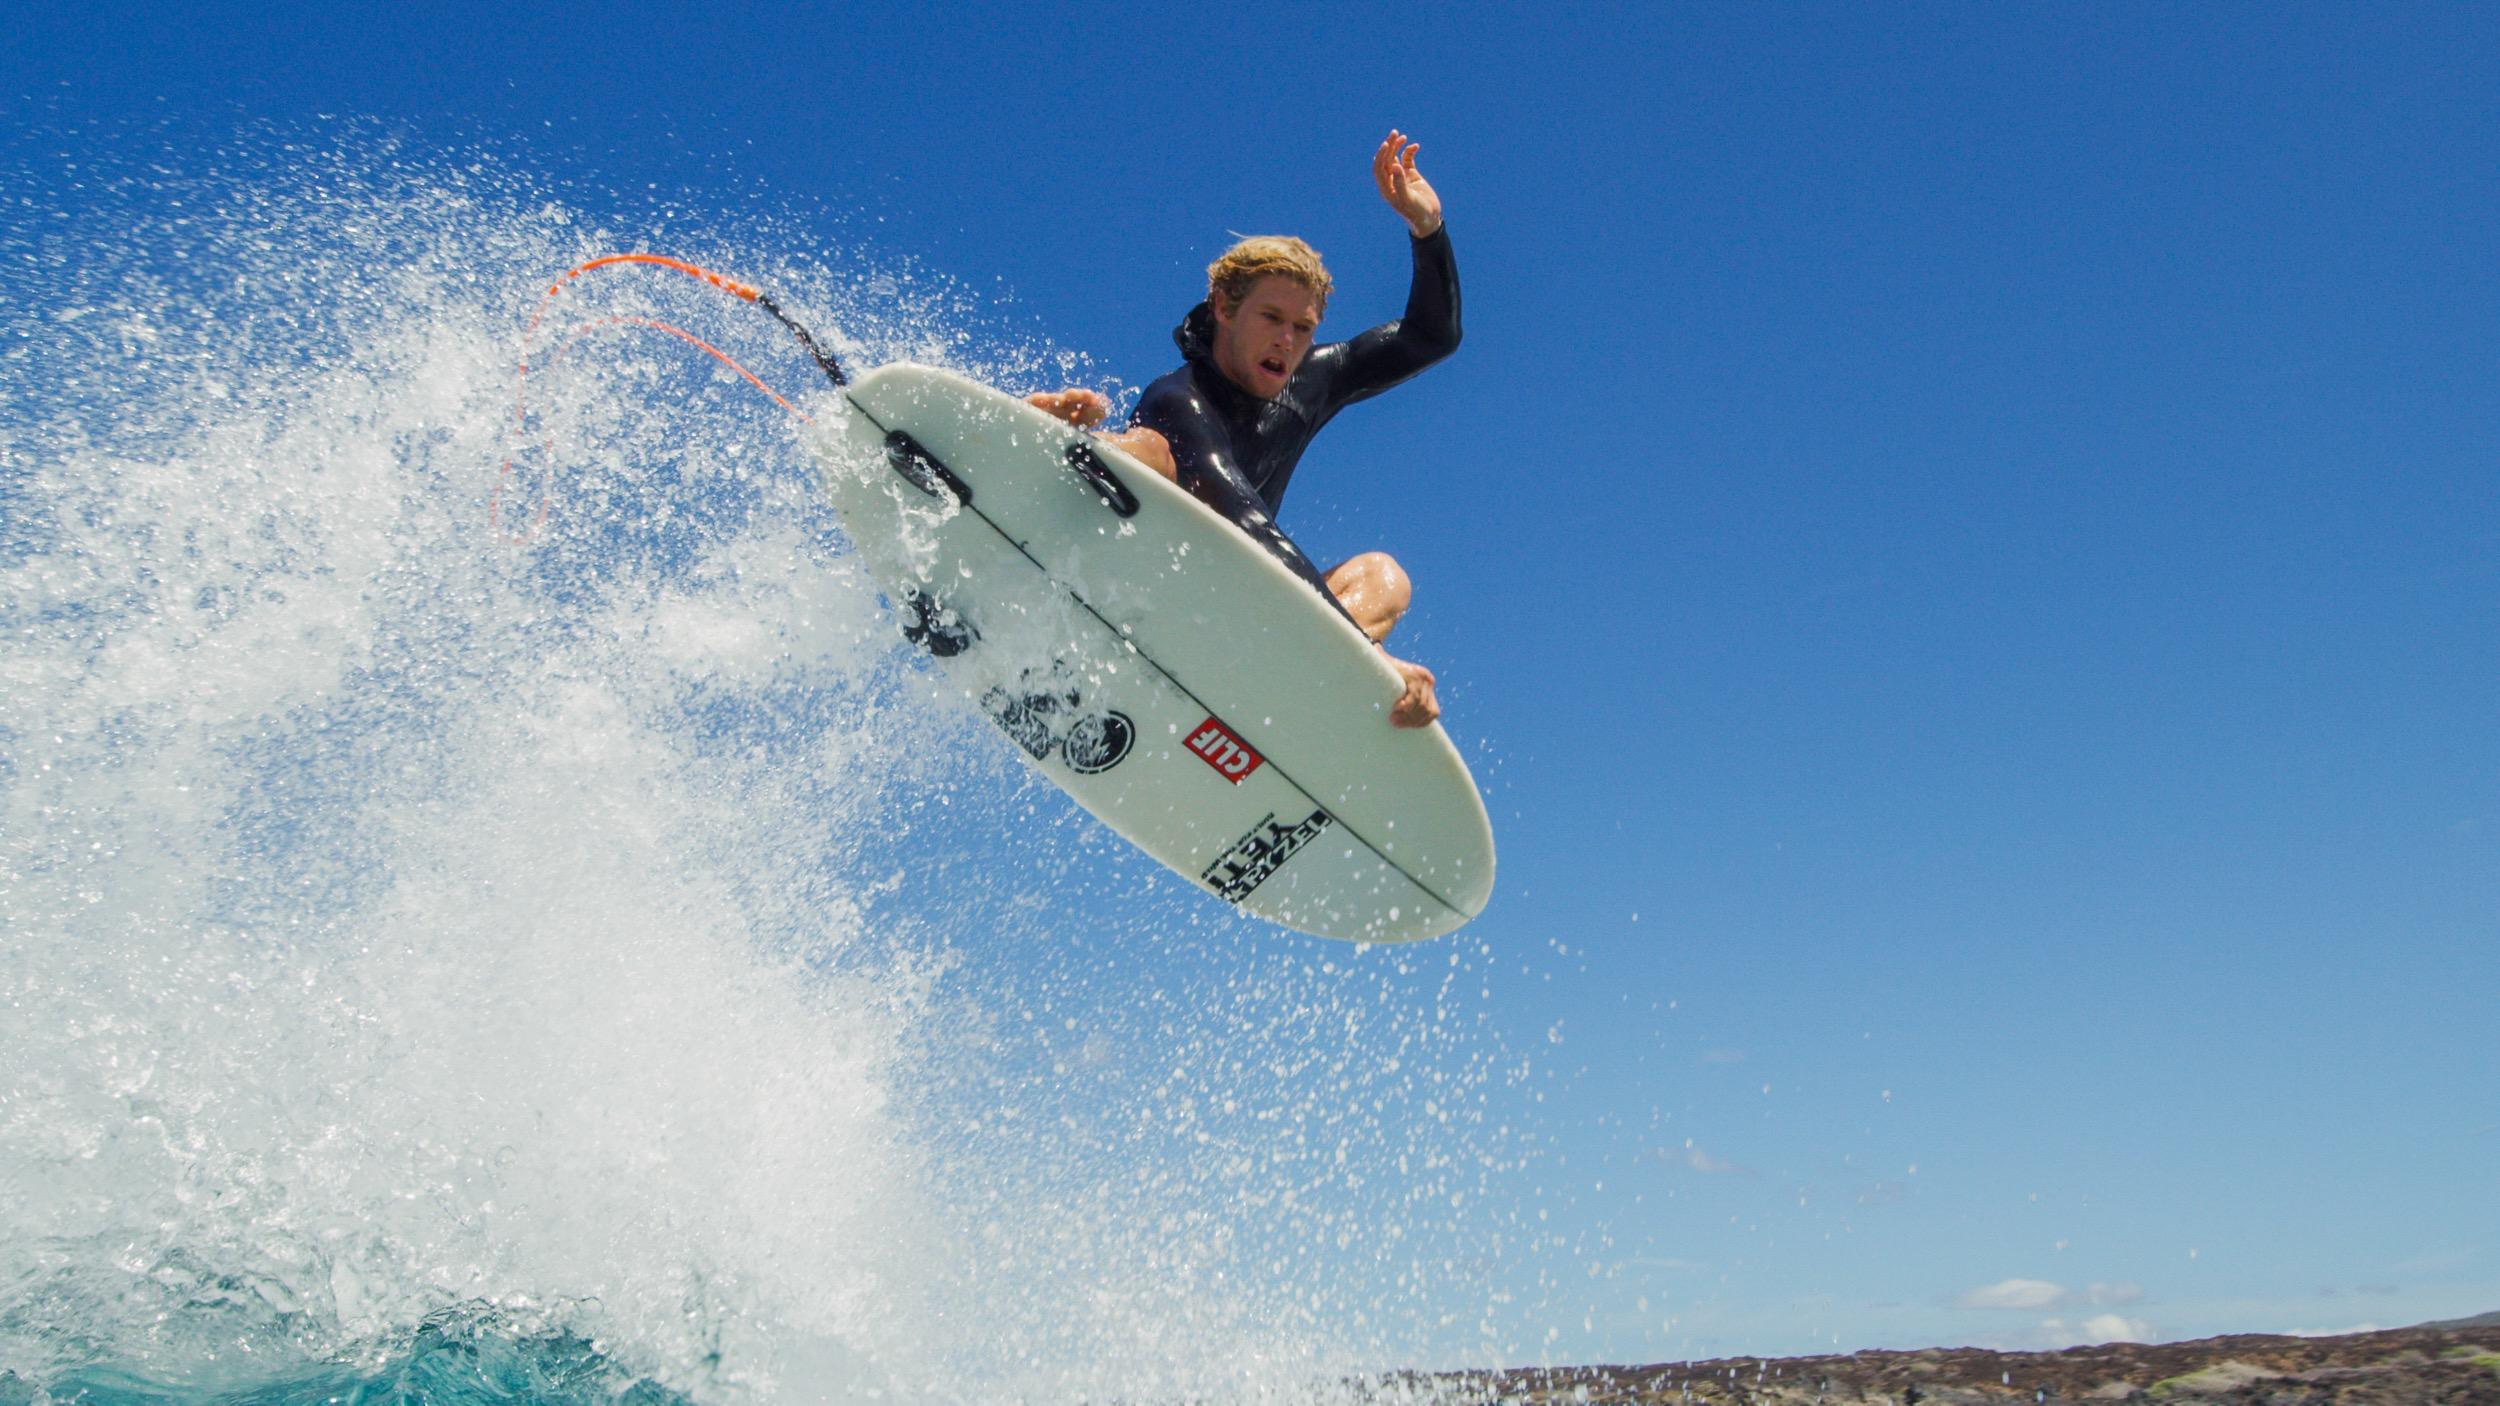 S21 Surf JJF Parallel Sea surf action kaimana orange 47